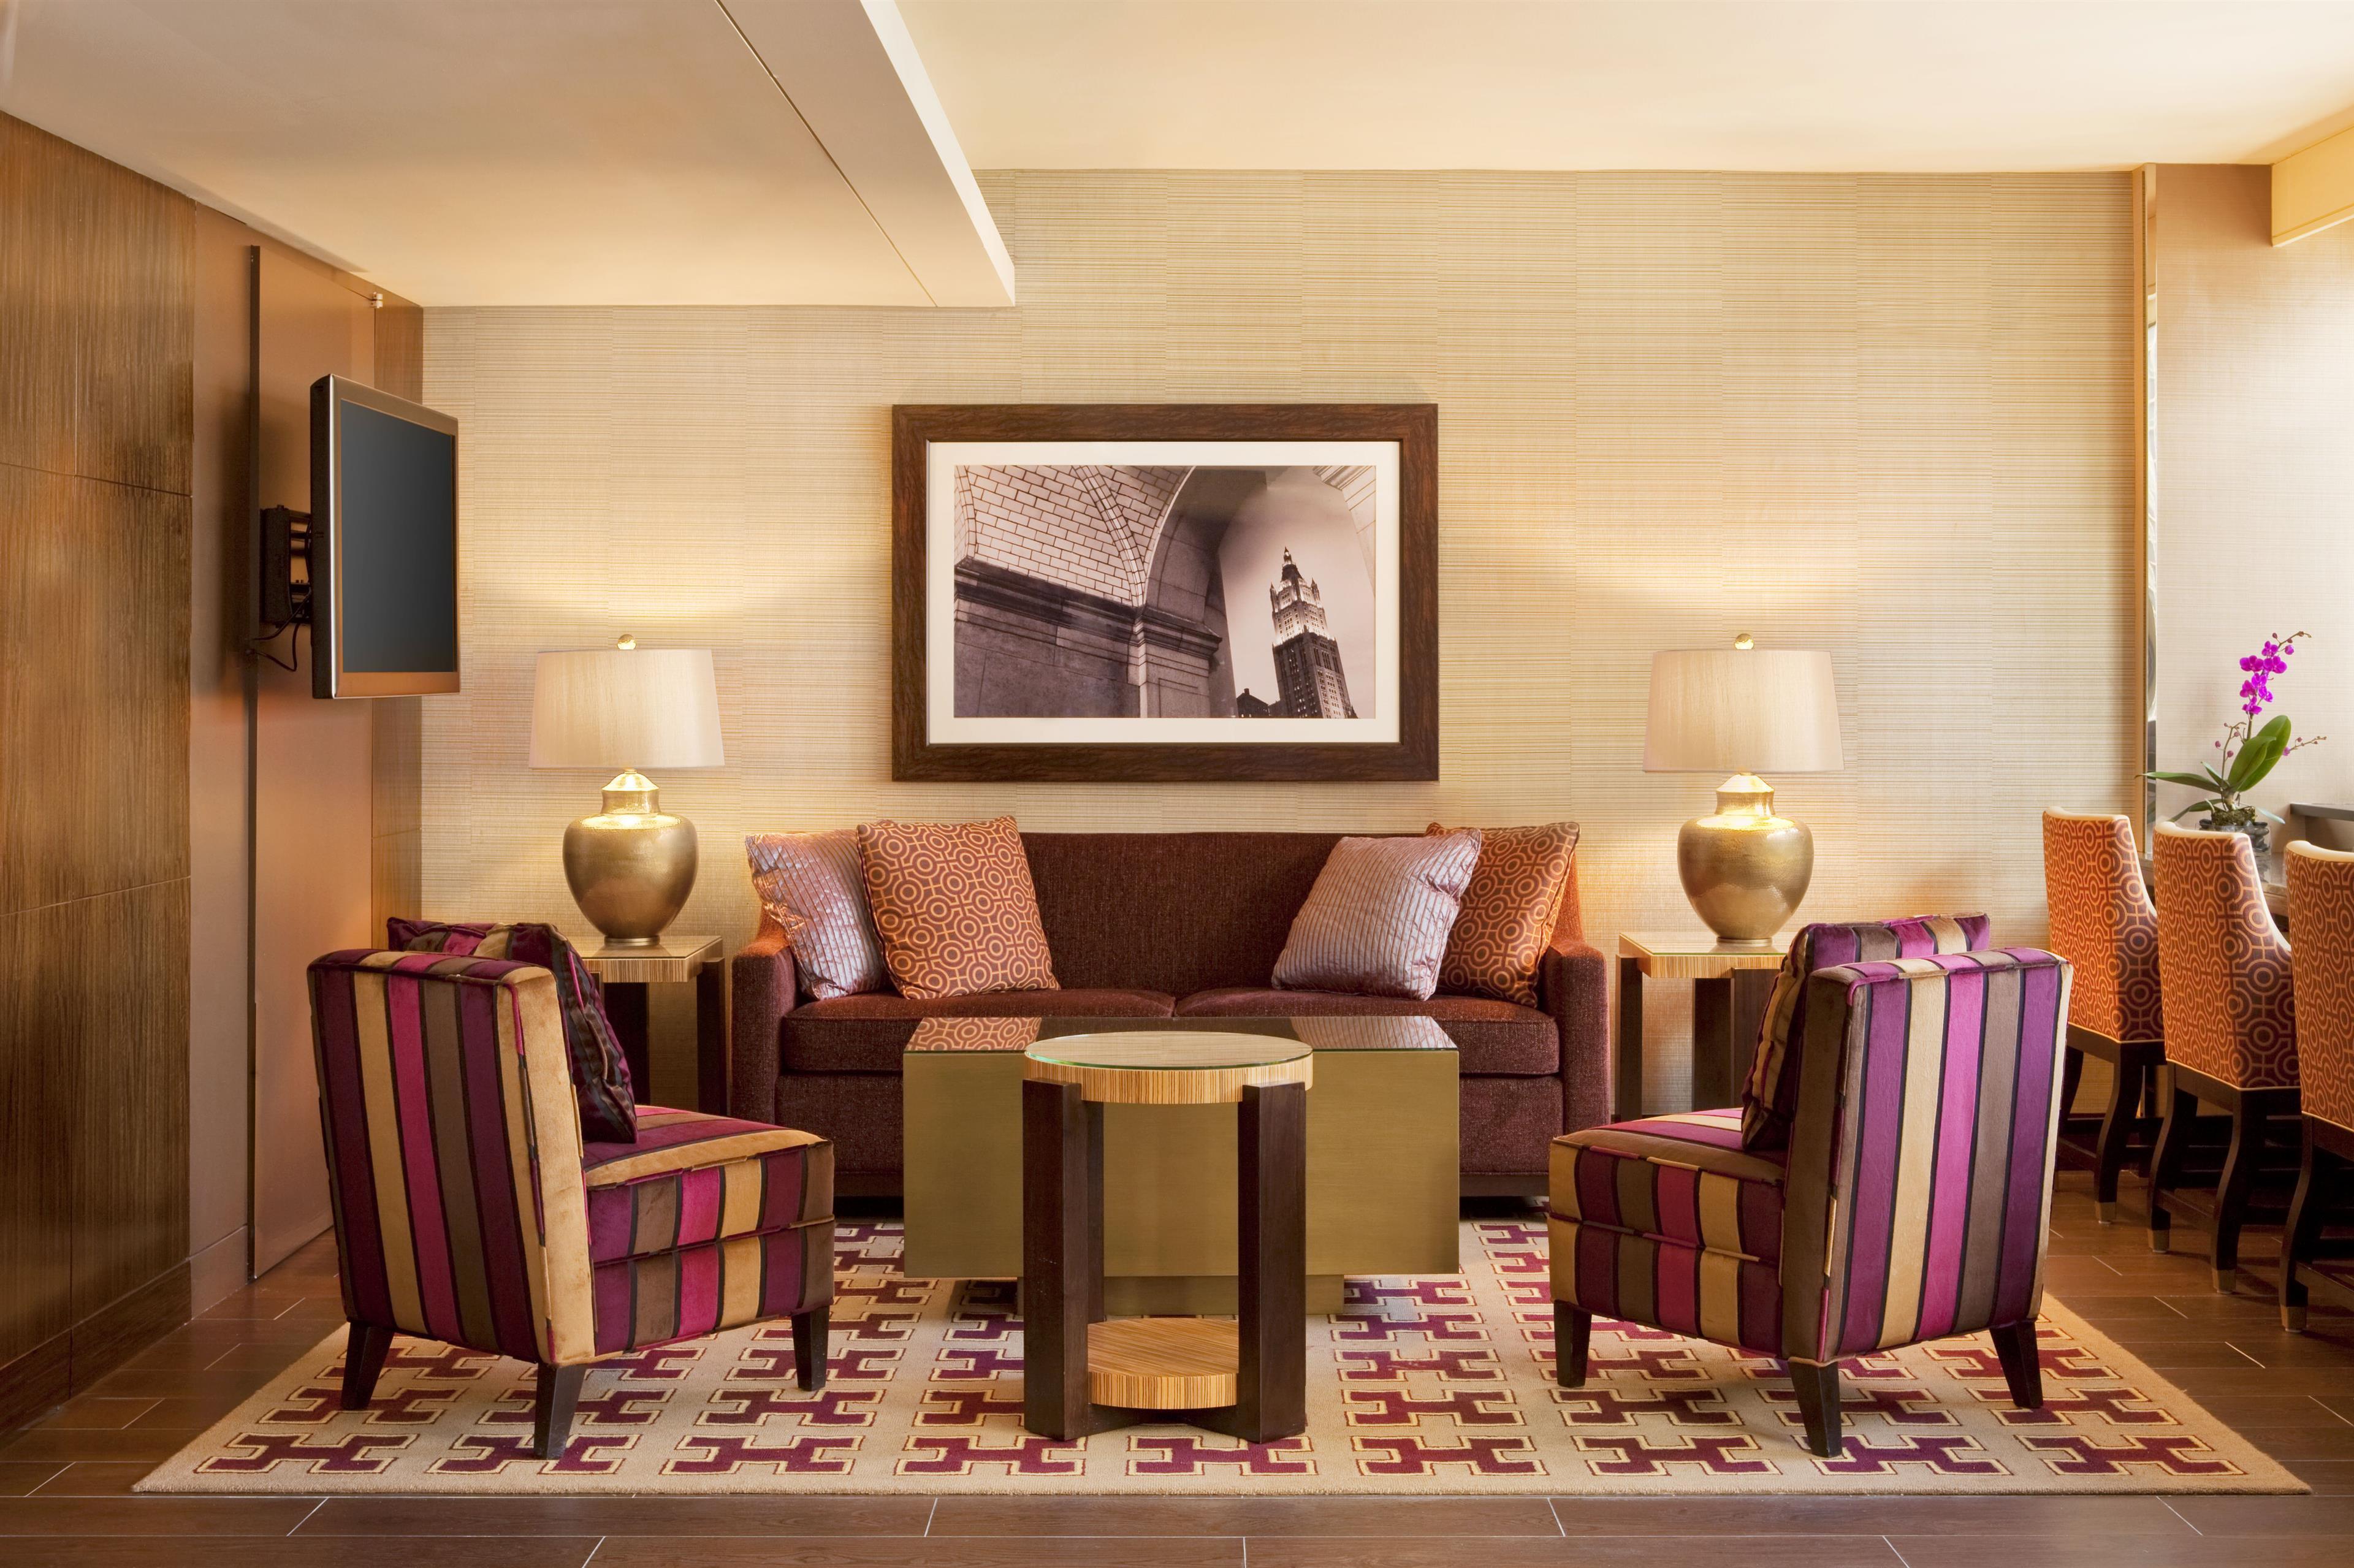 Sheraton New York Times Square Hotel image 18